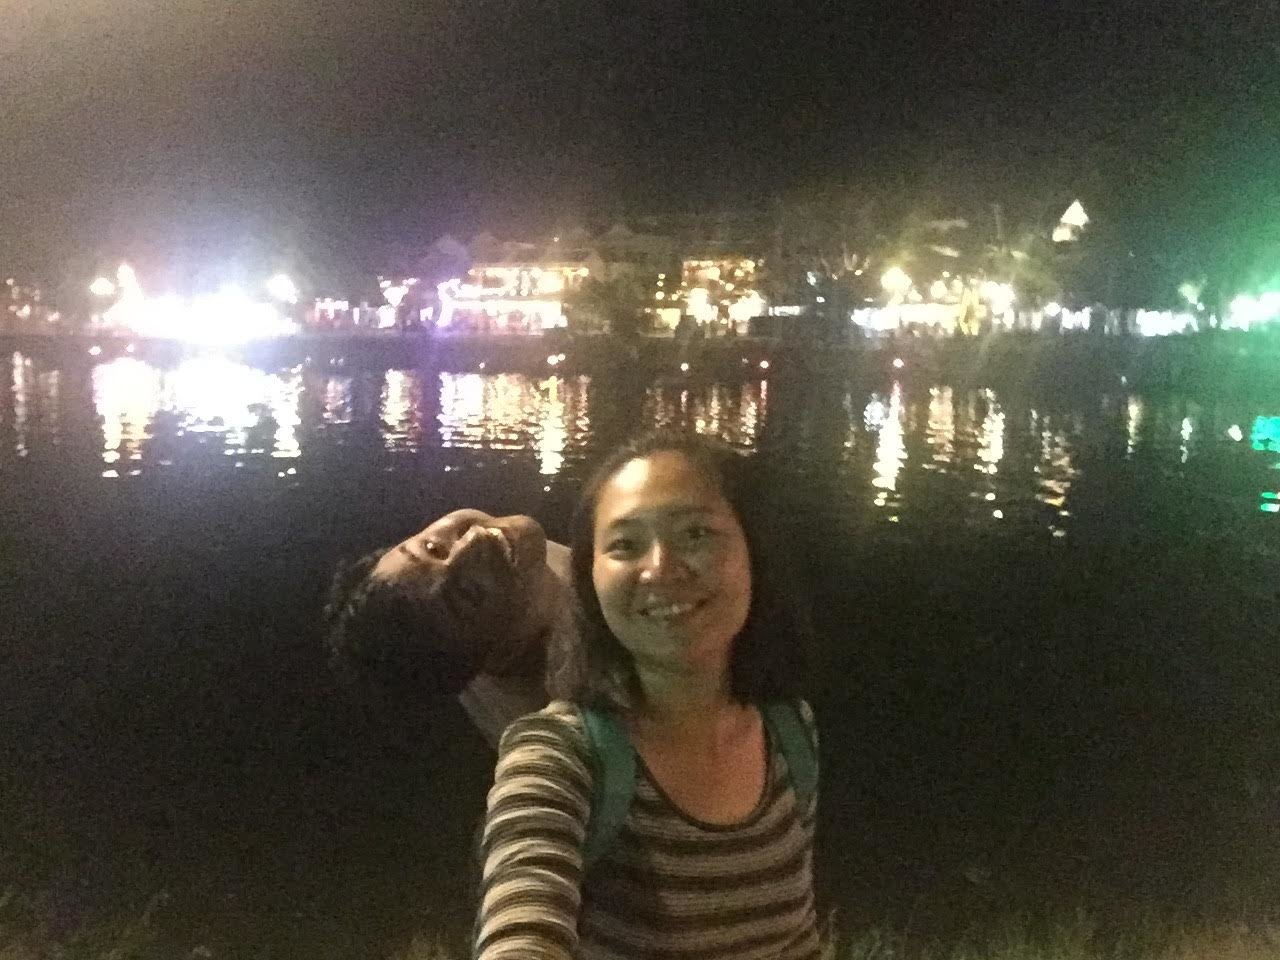 Fun at the Hoi An Lake  | Photo taken by Seng Aung S